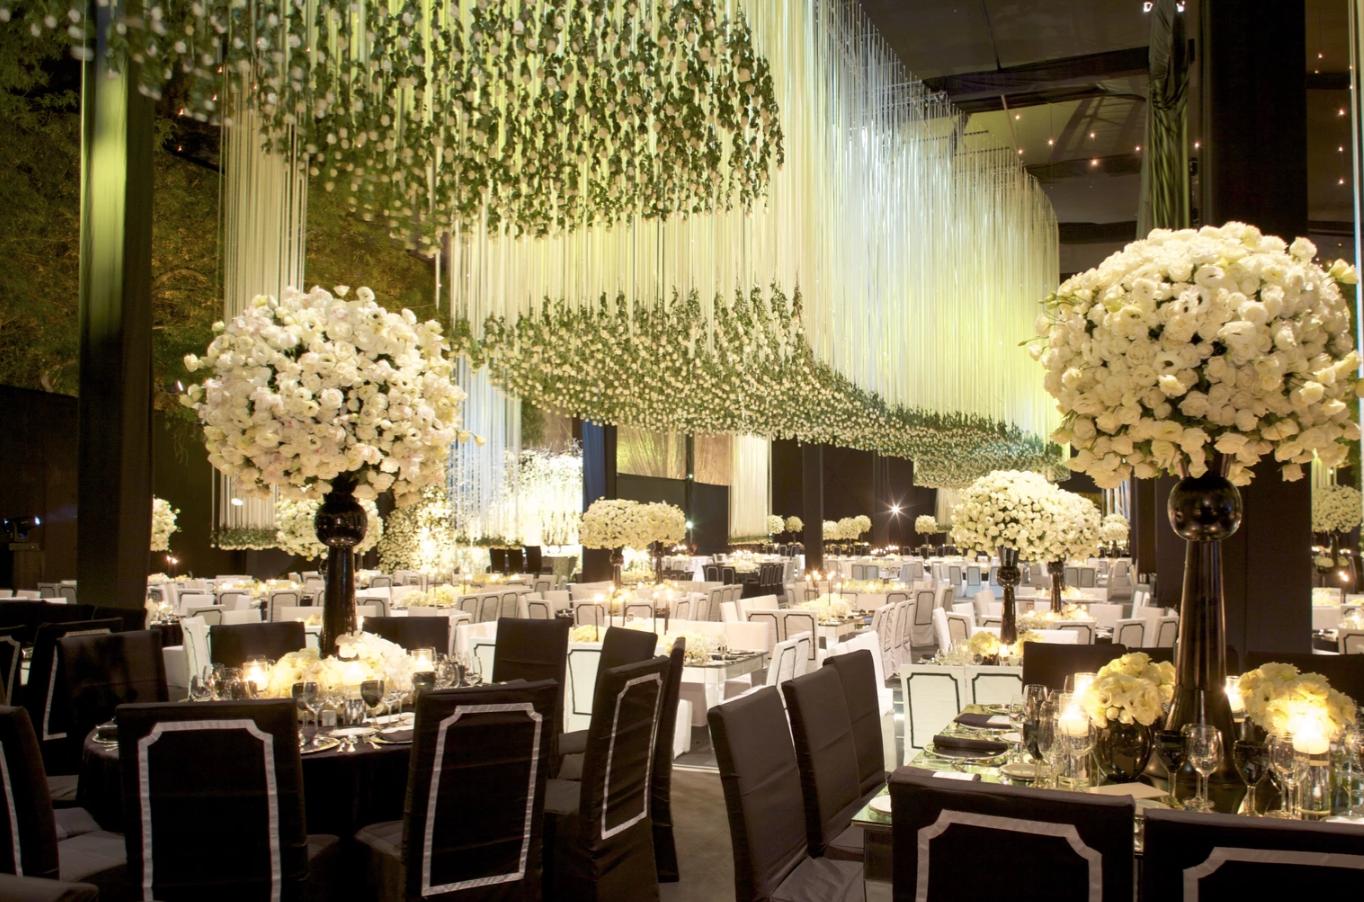 Gonzalez Helfon bodas, wedding planner en méxico, proveedores de boda exclusivos - Wedding Hub - 07